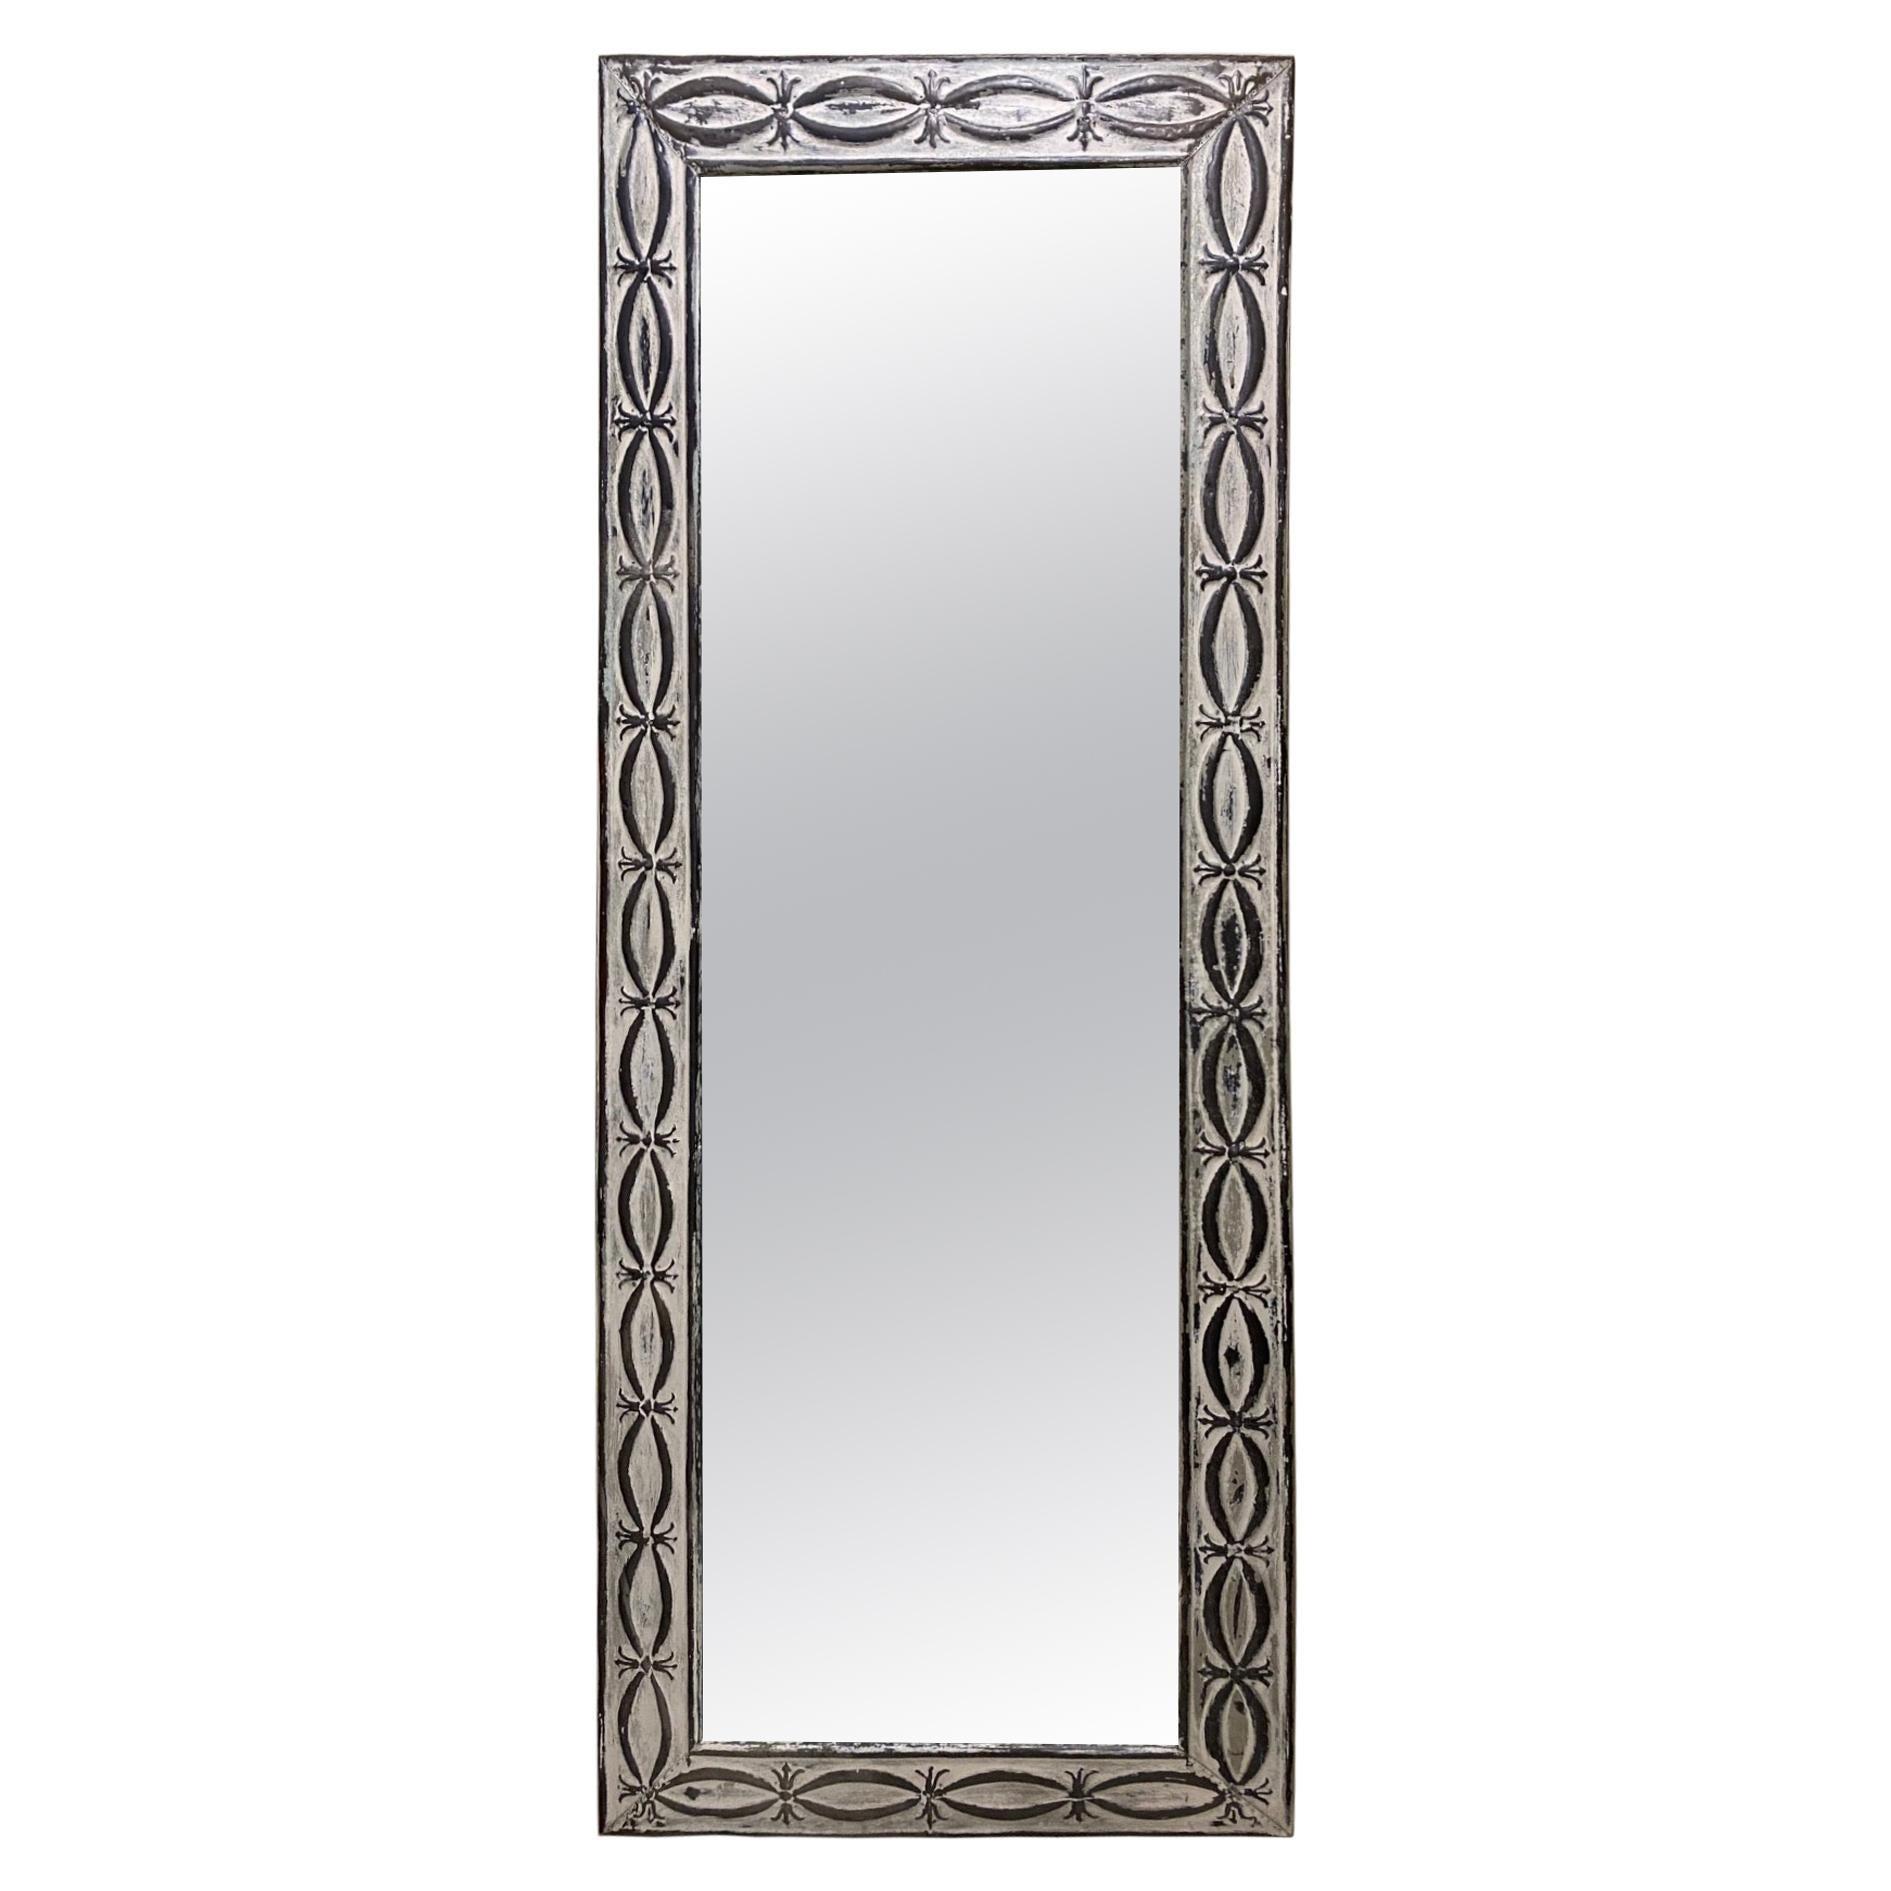 Full Length Pier Mirror